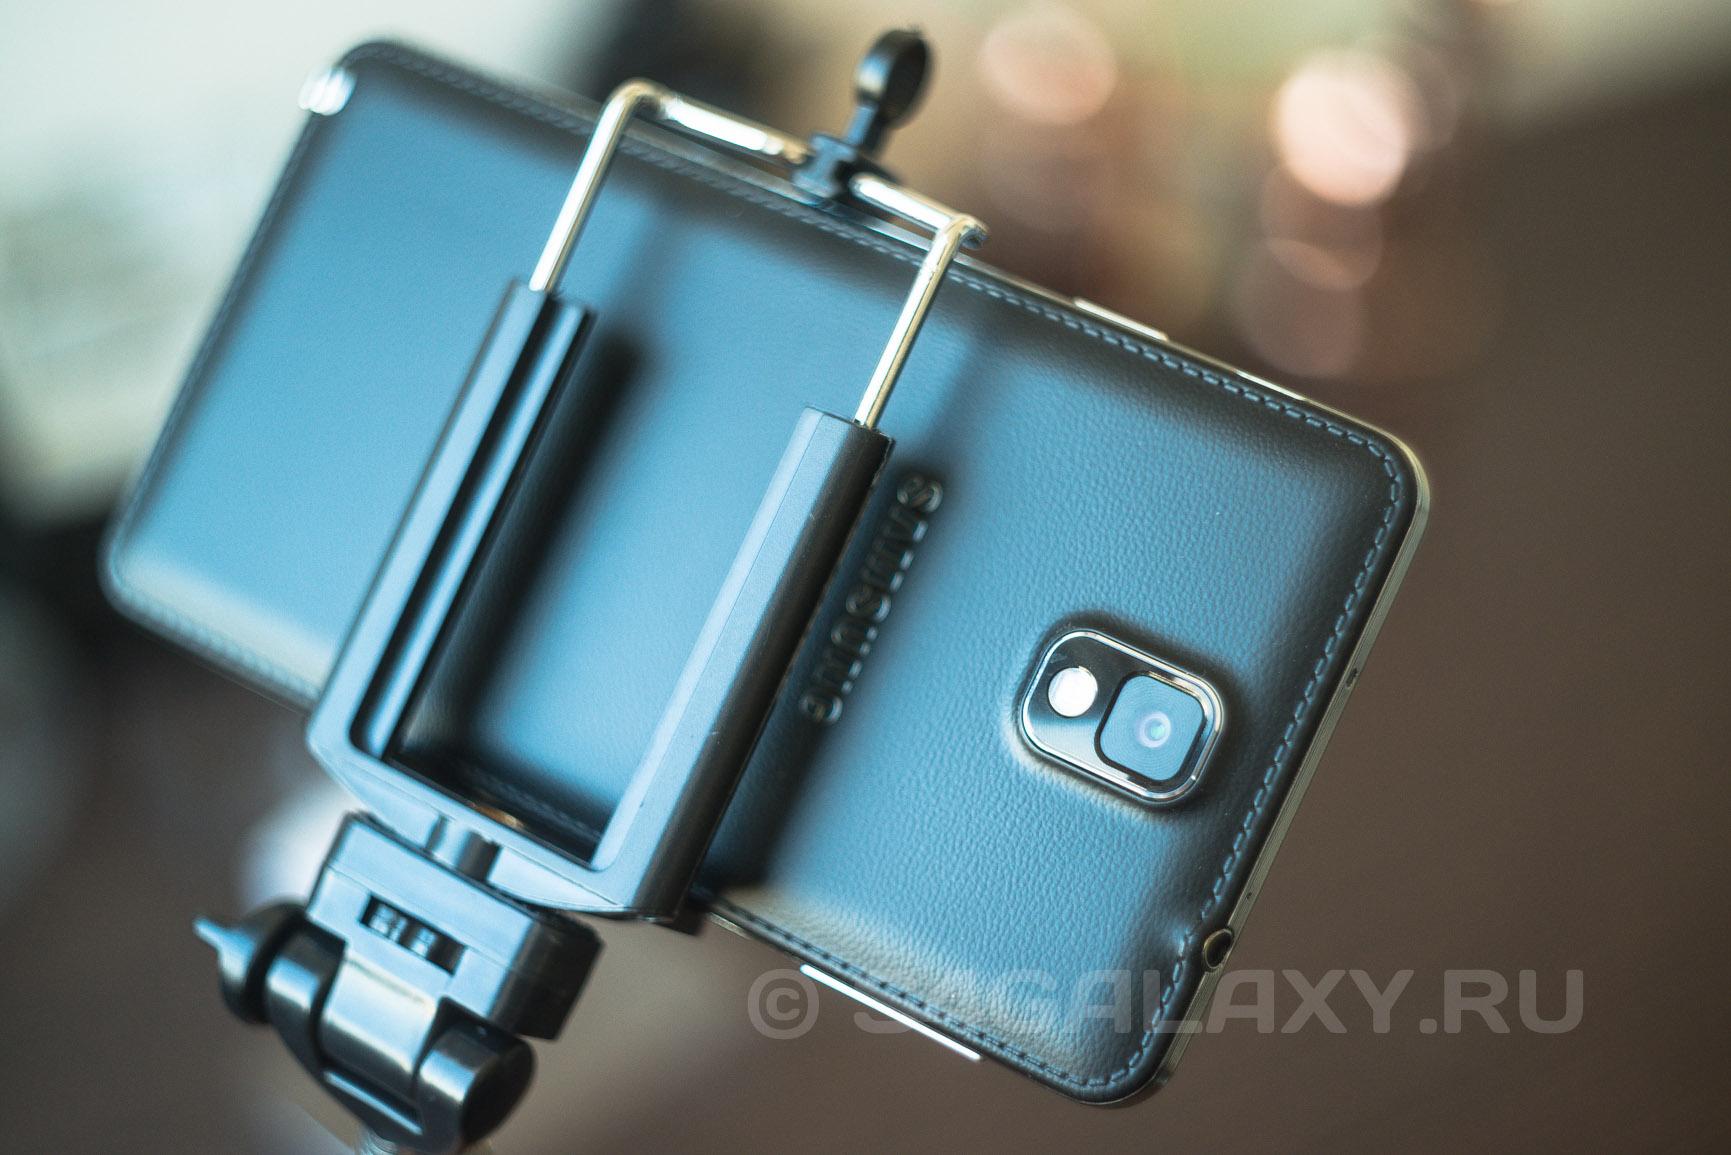 Держатель для Galaxy Note 3